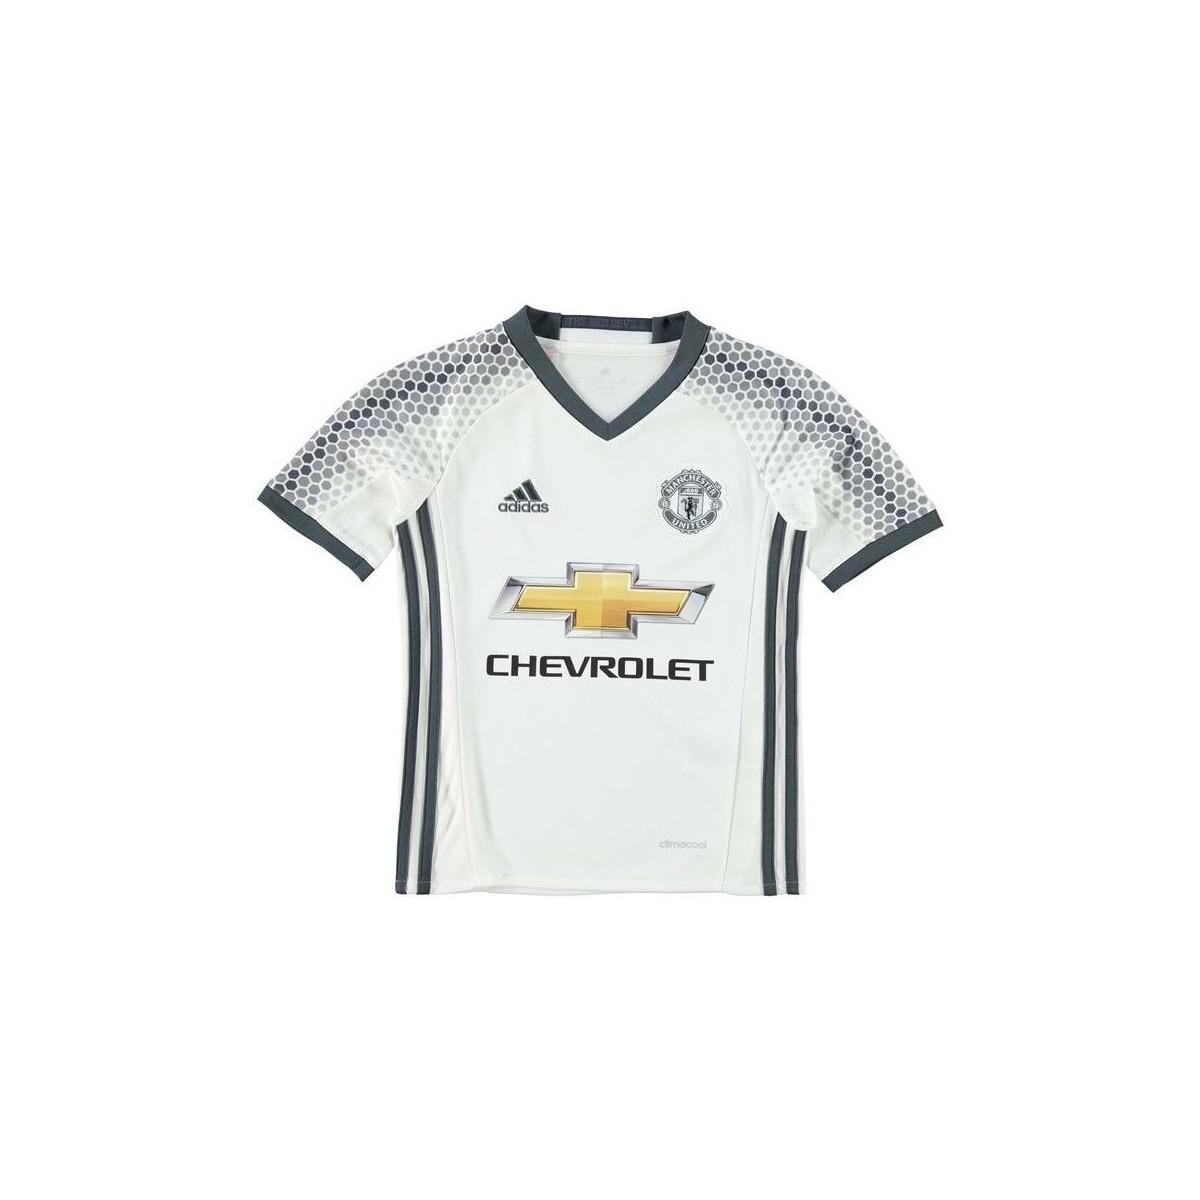 c1cd54fa1 Adidas - 2016-17 Man Utd Third Shirt (ibrahimovic 9) - Kids Women s. View  fullscreen